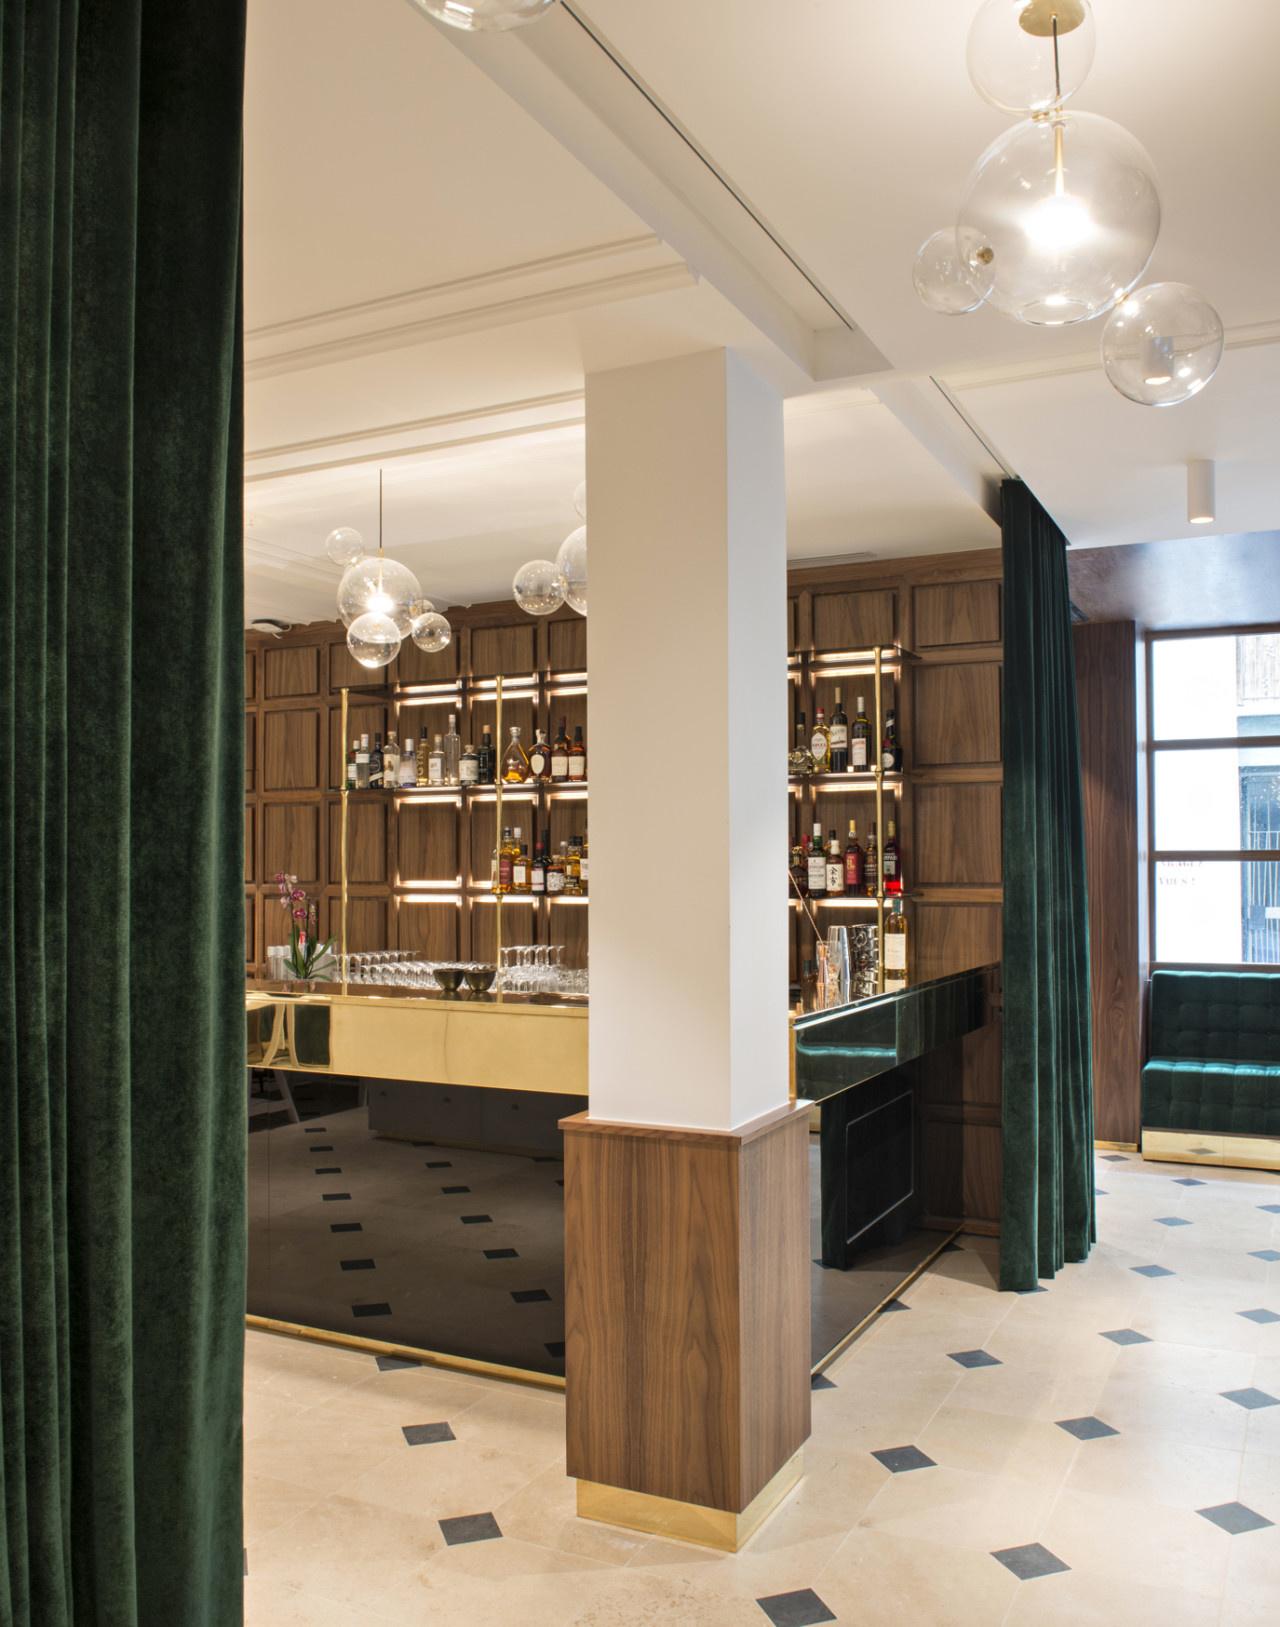 Новый бутик-отель в центре Парижа (галерея 4, фото 4)